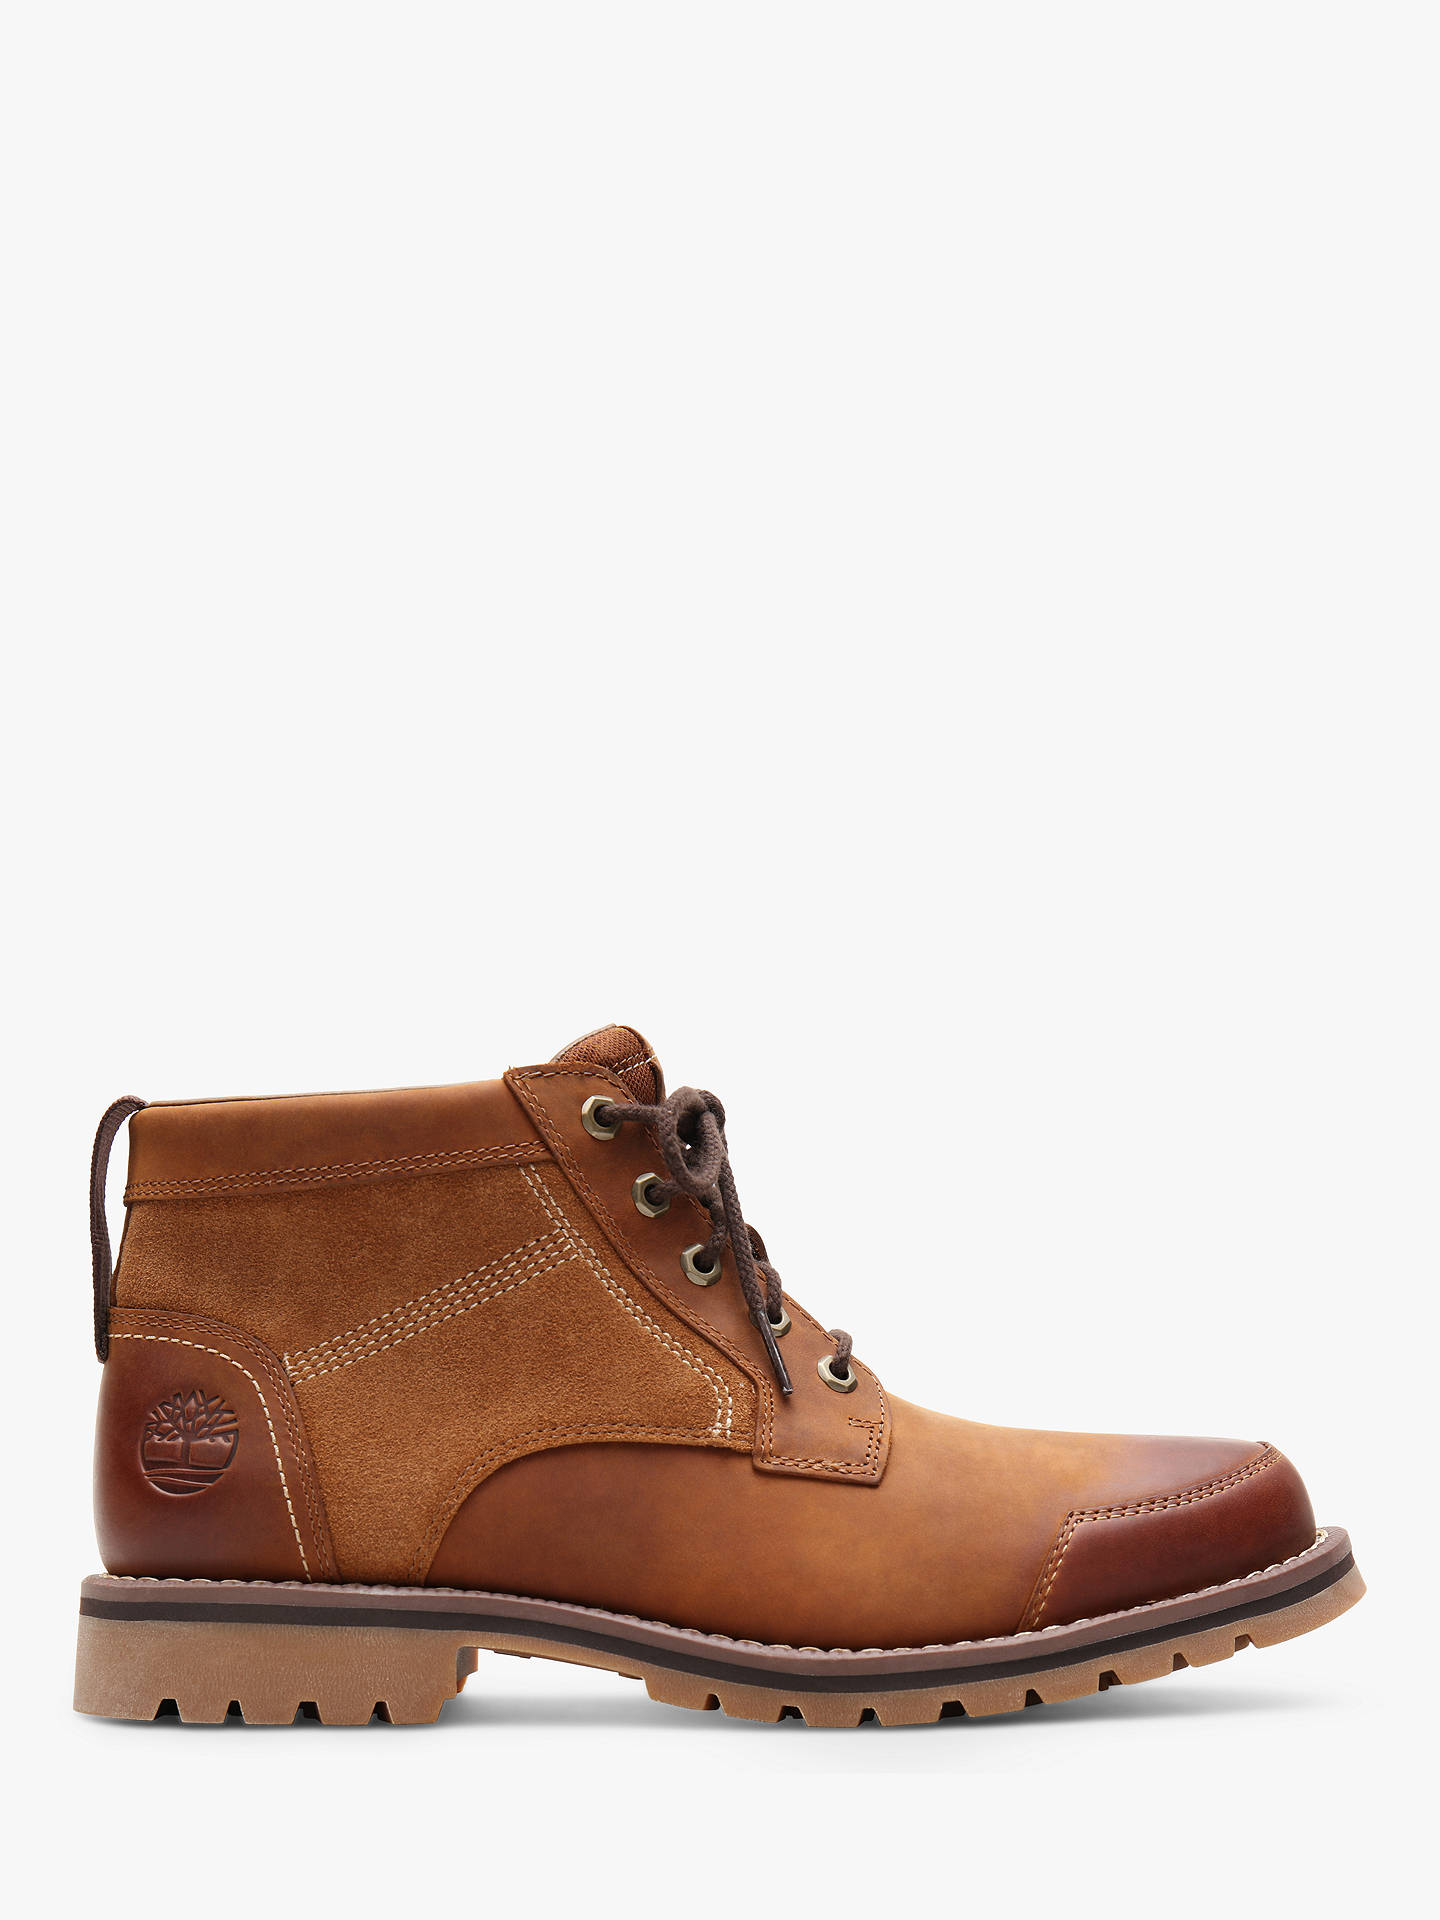 1ee1071e619 Timberland Larchmont Chukka Boot, Medium Brown, Medium Brown